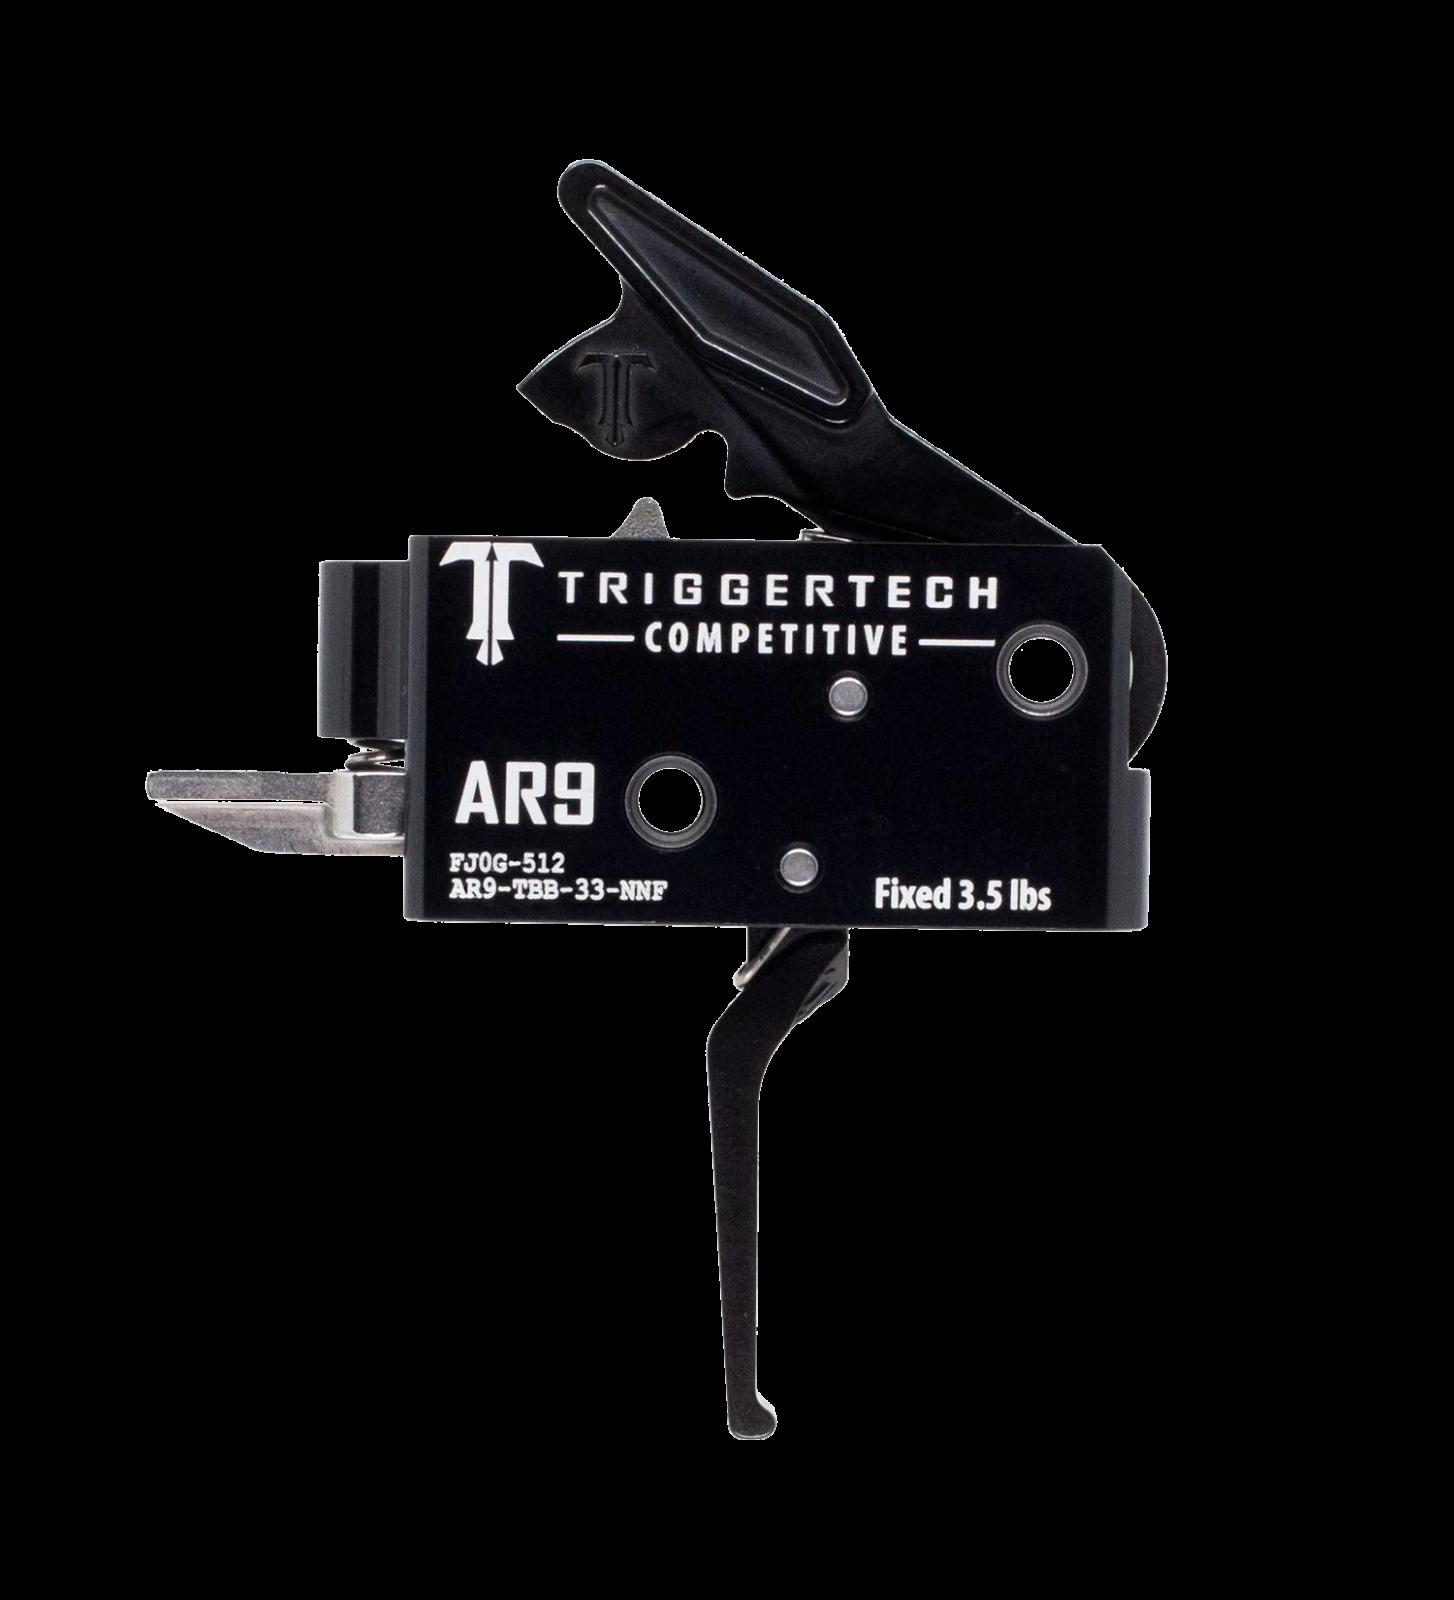 Spoušť TriggerTech AR9 Competetive - rovná, černá